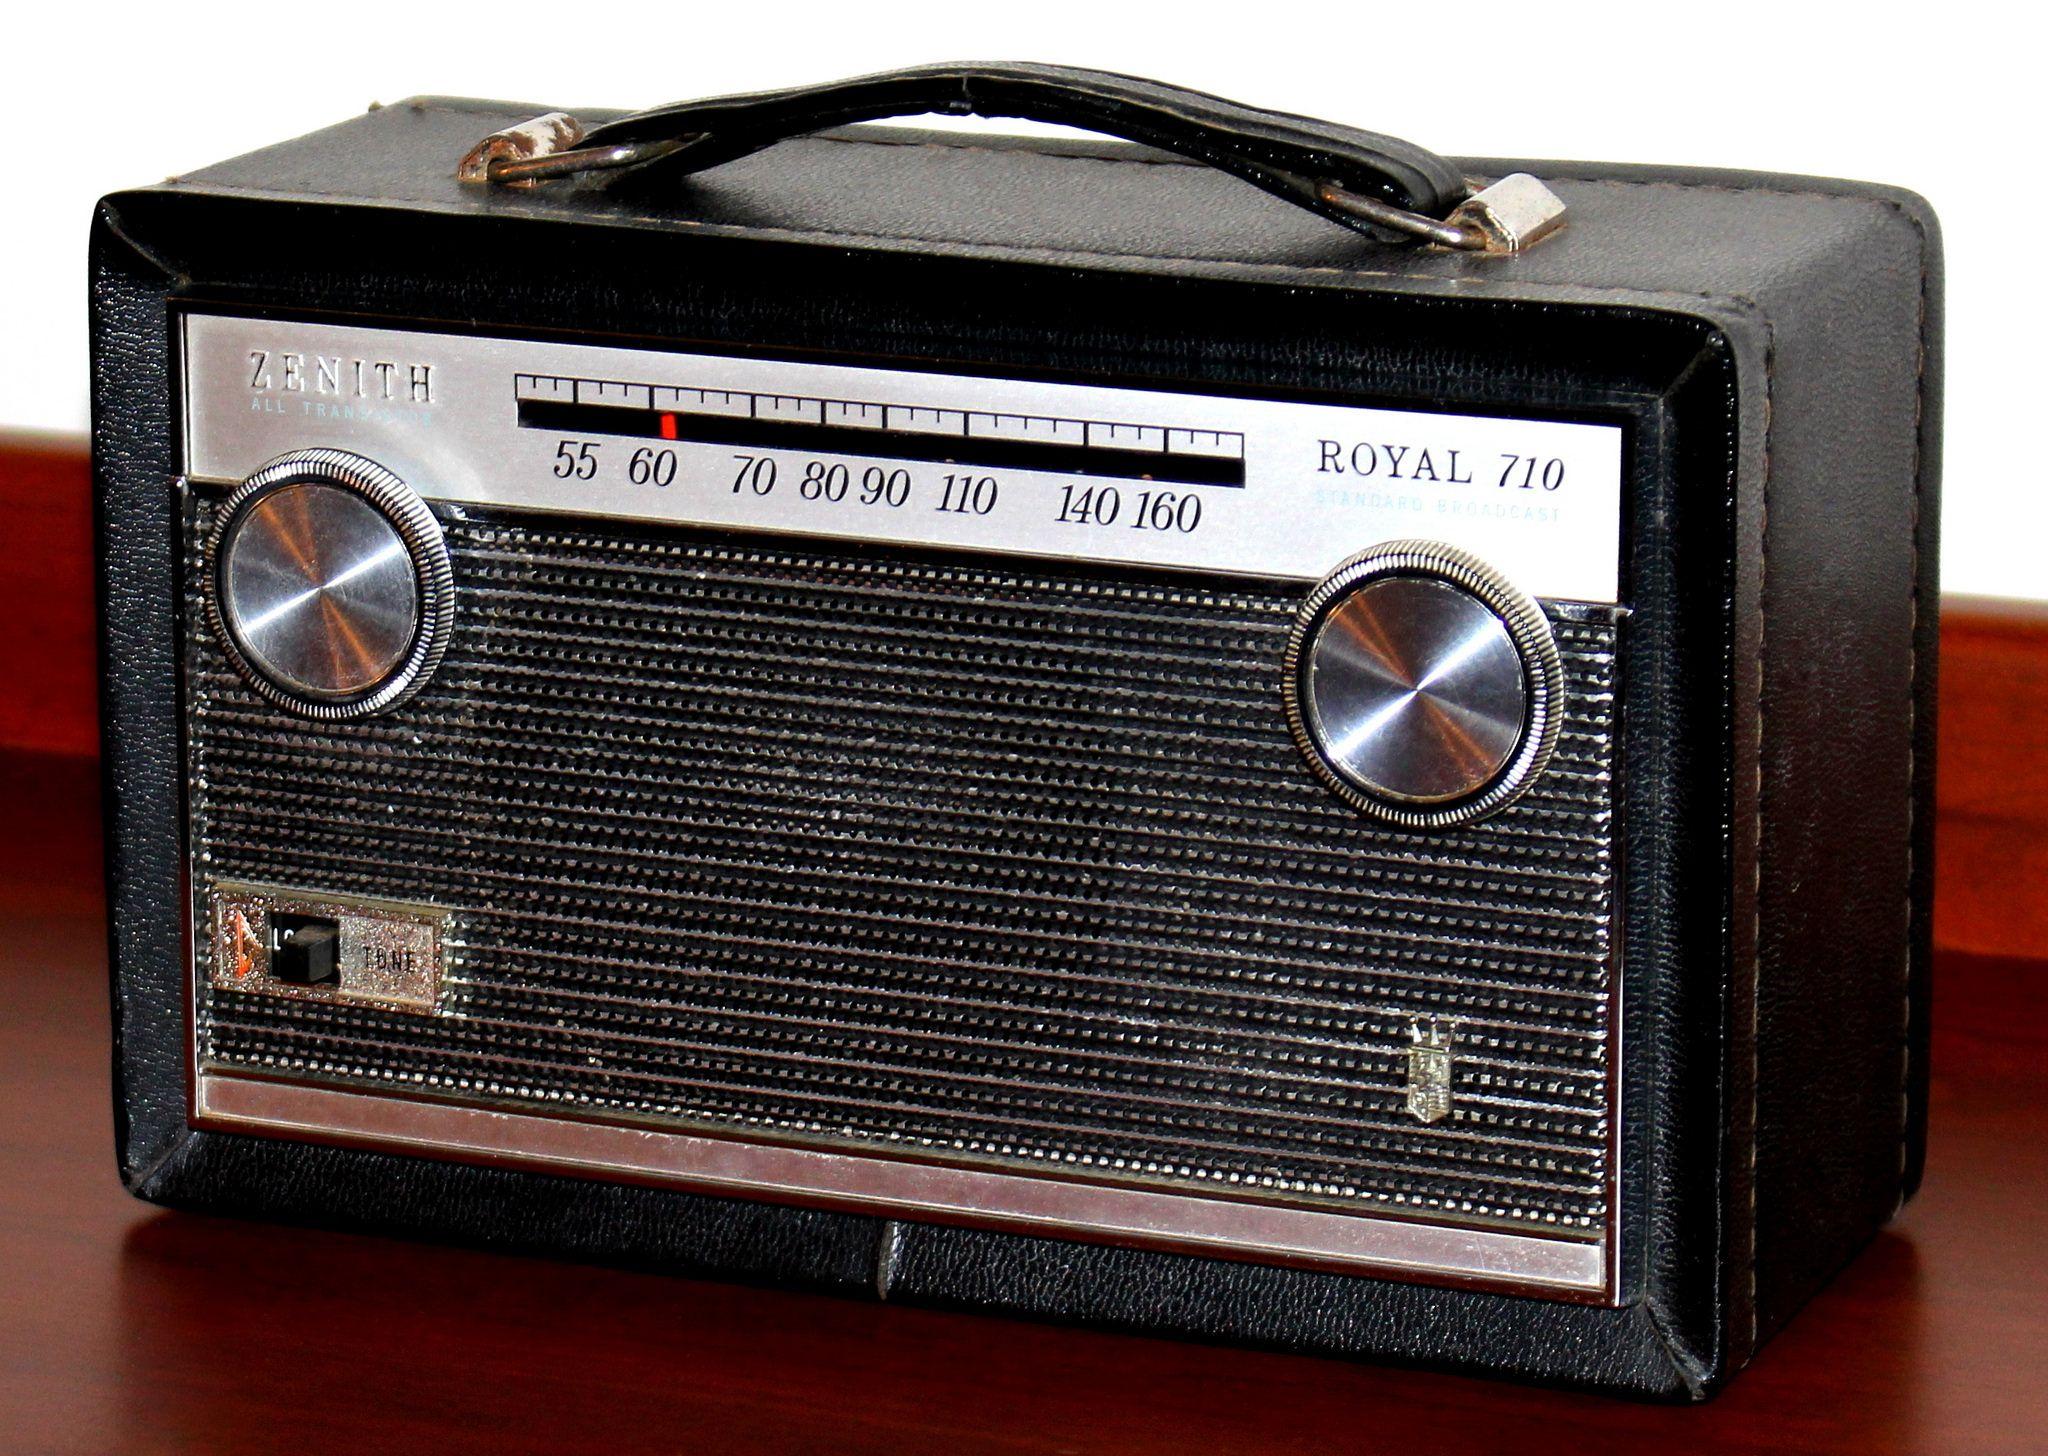 Vintage Zenith Portable Transistor Radio Model Royal 710m Am